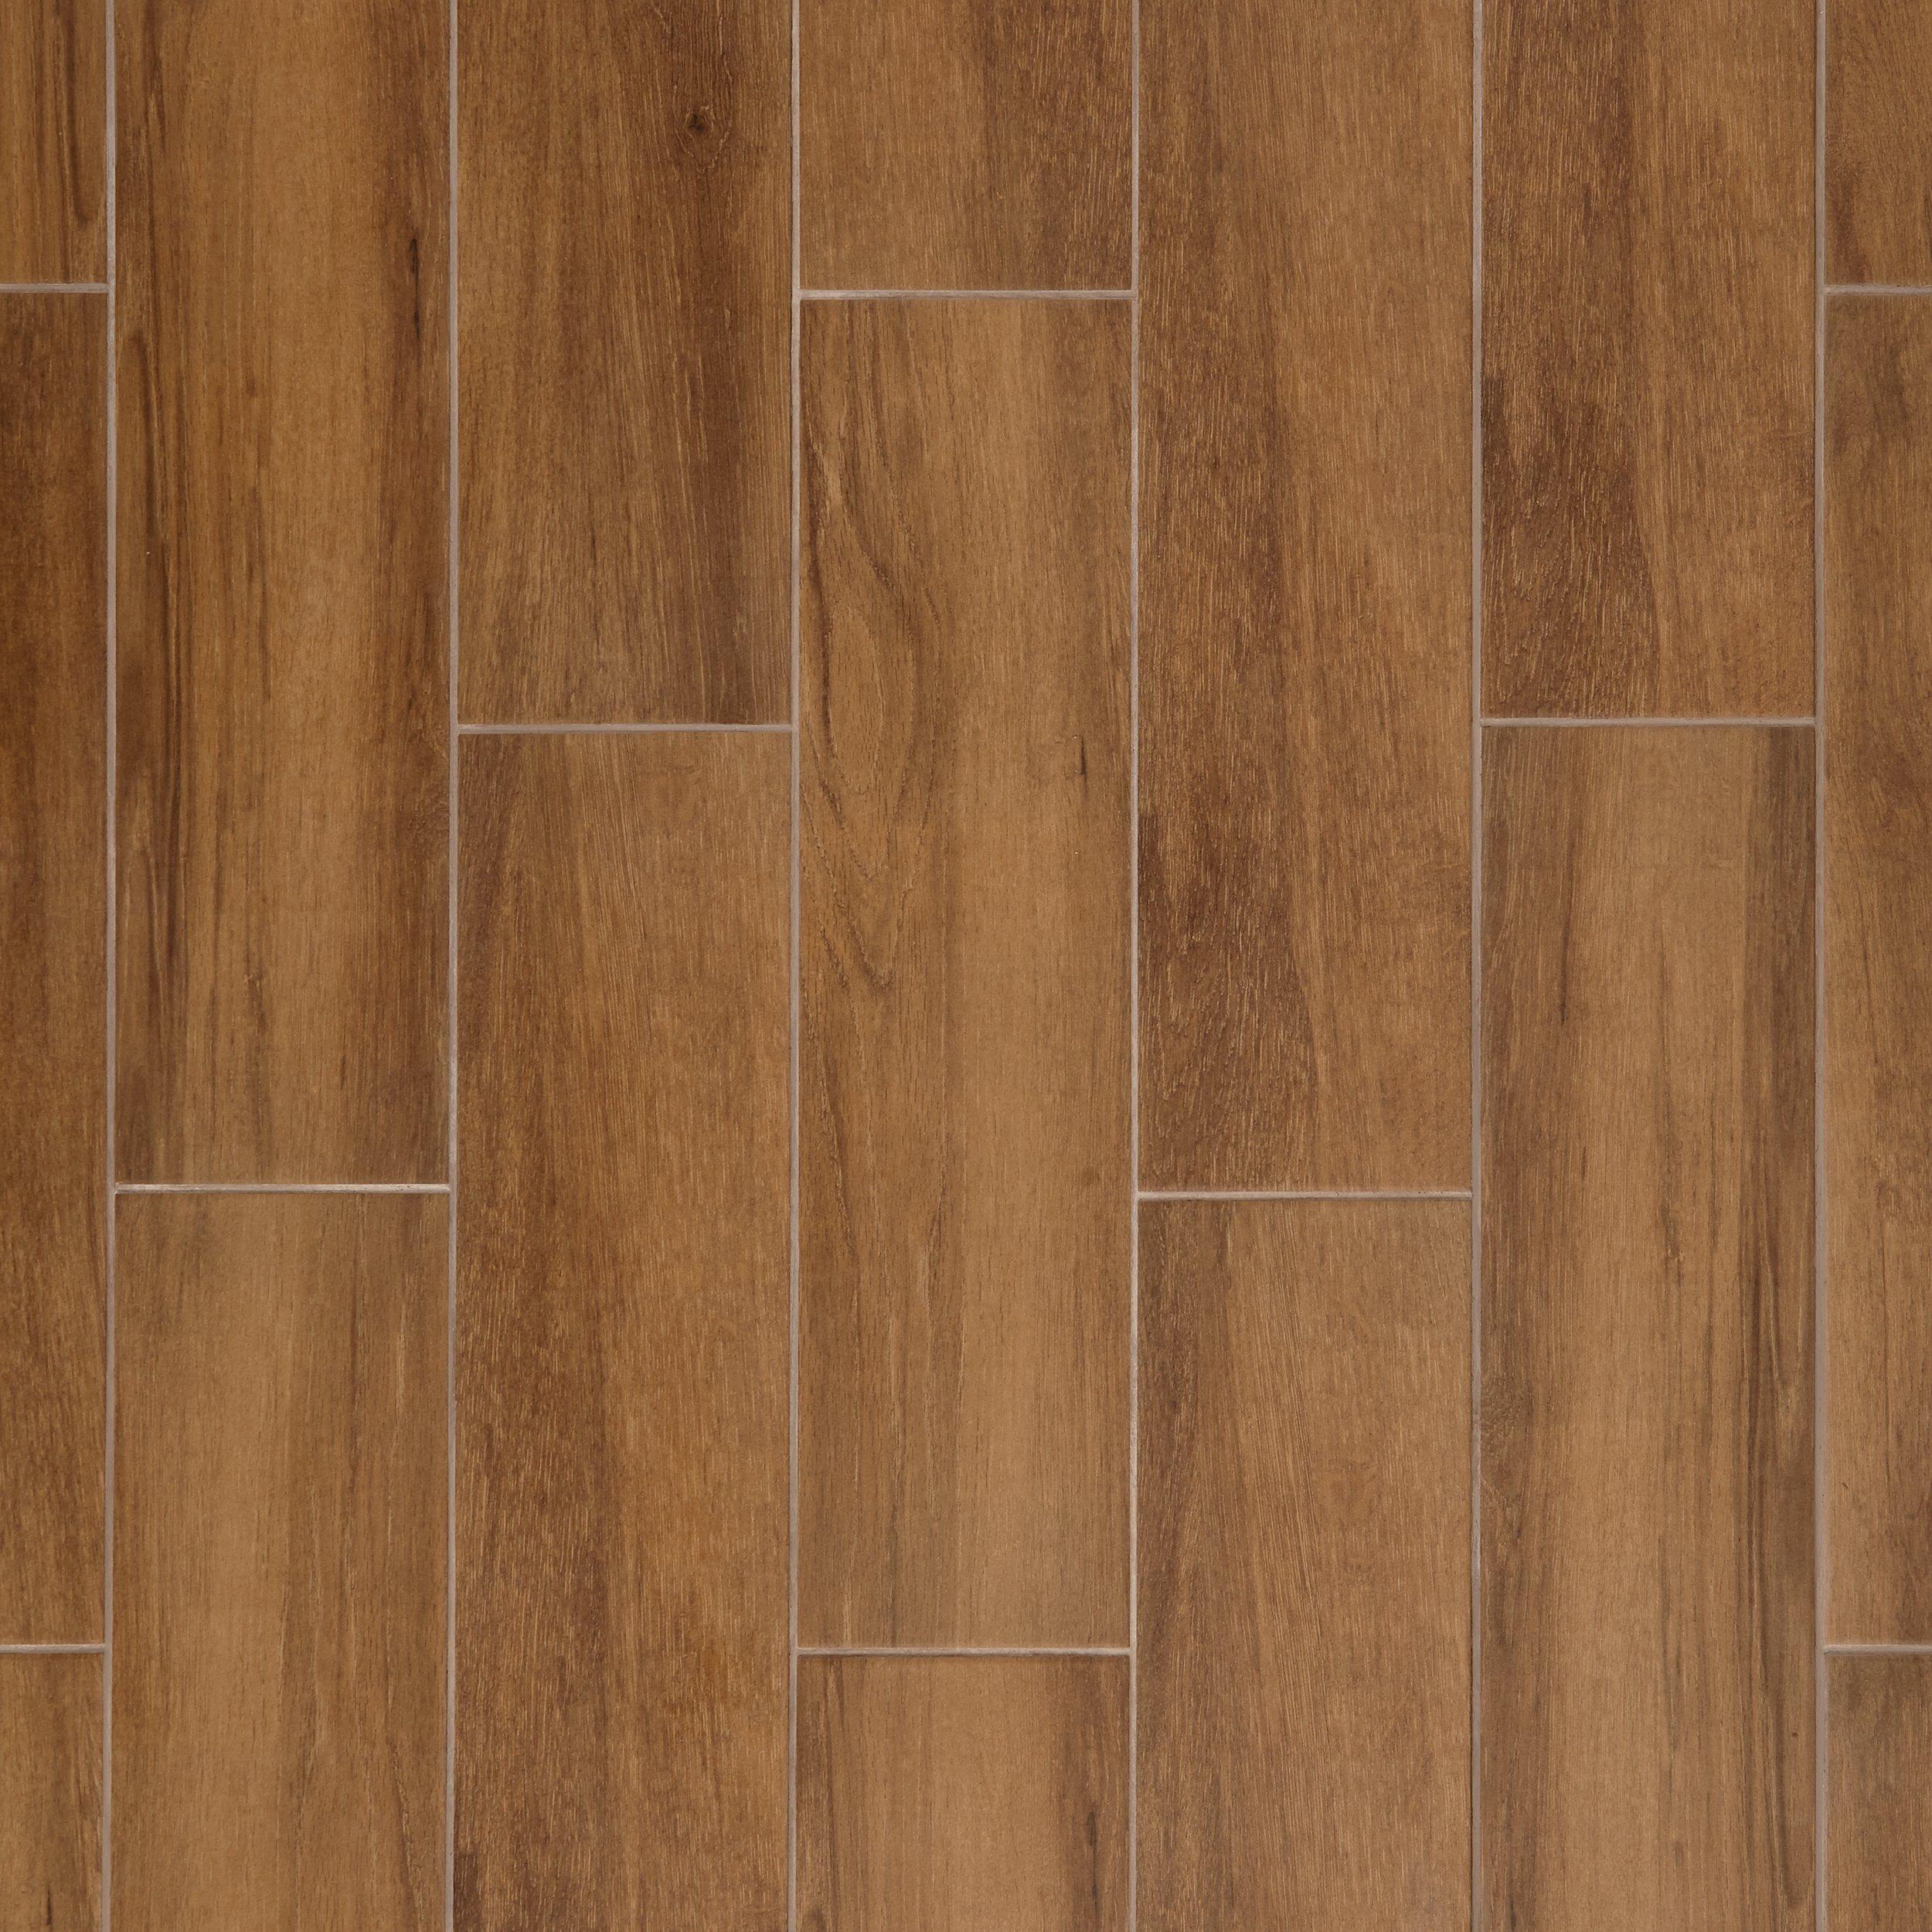 wood look tile floor decor. Black Bedroom Furniture Sets. Home Design Ideas